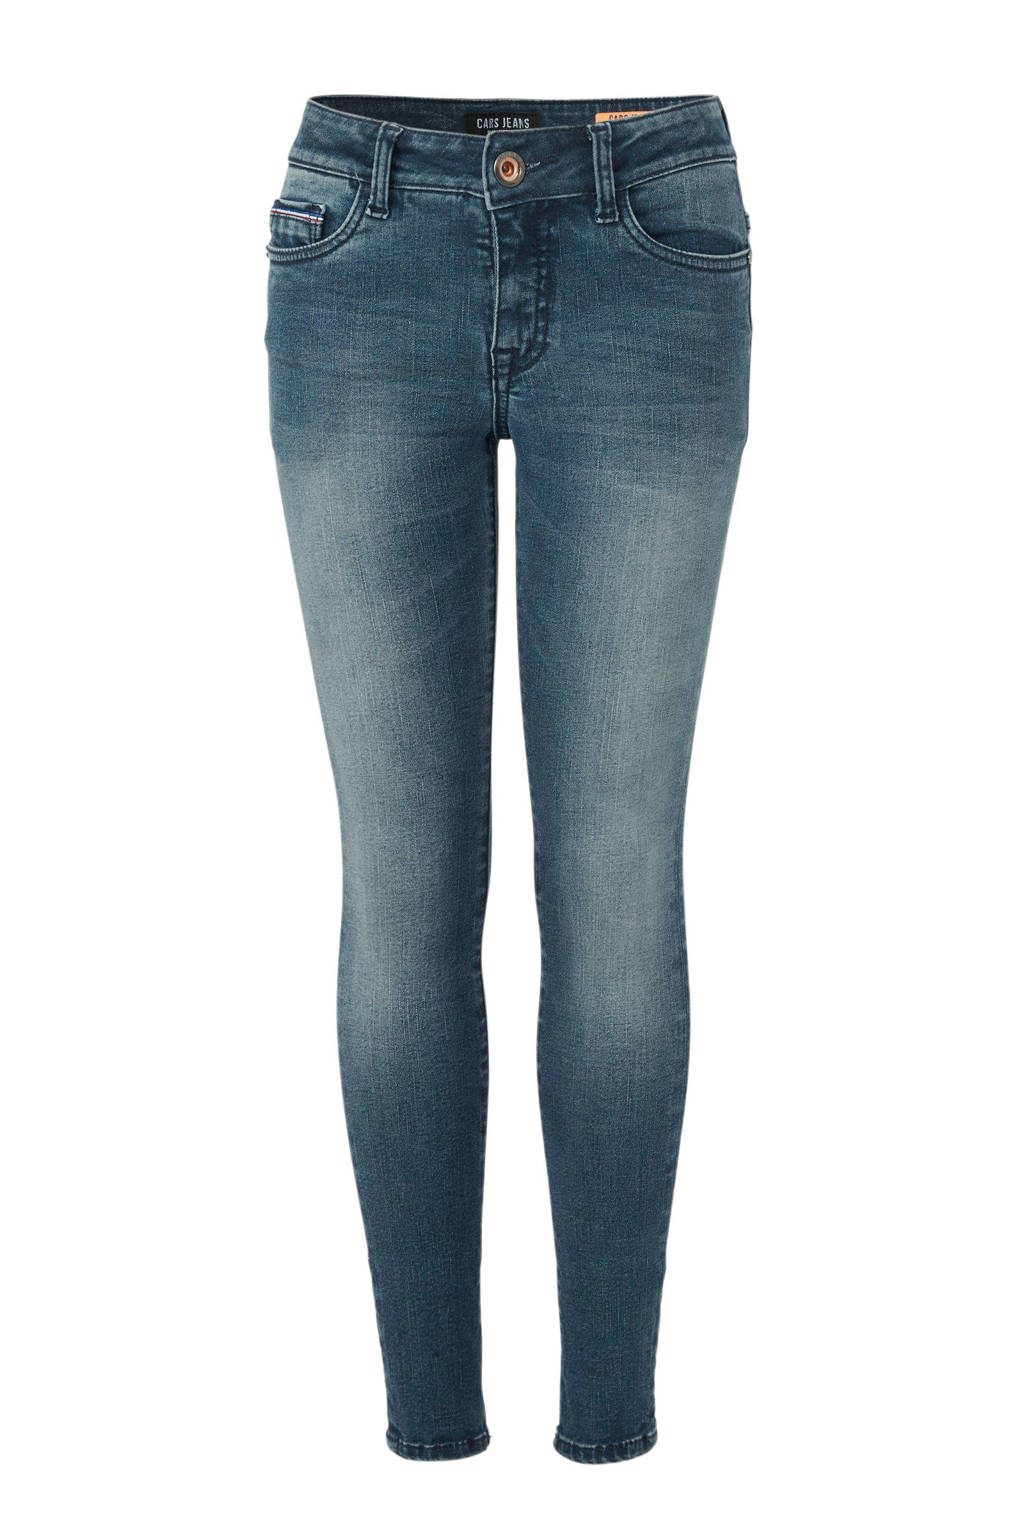 Cars super skinny jeans Diego blauw/groen, Blauw/groen